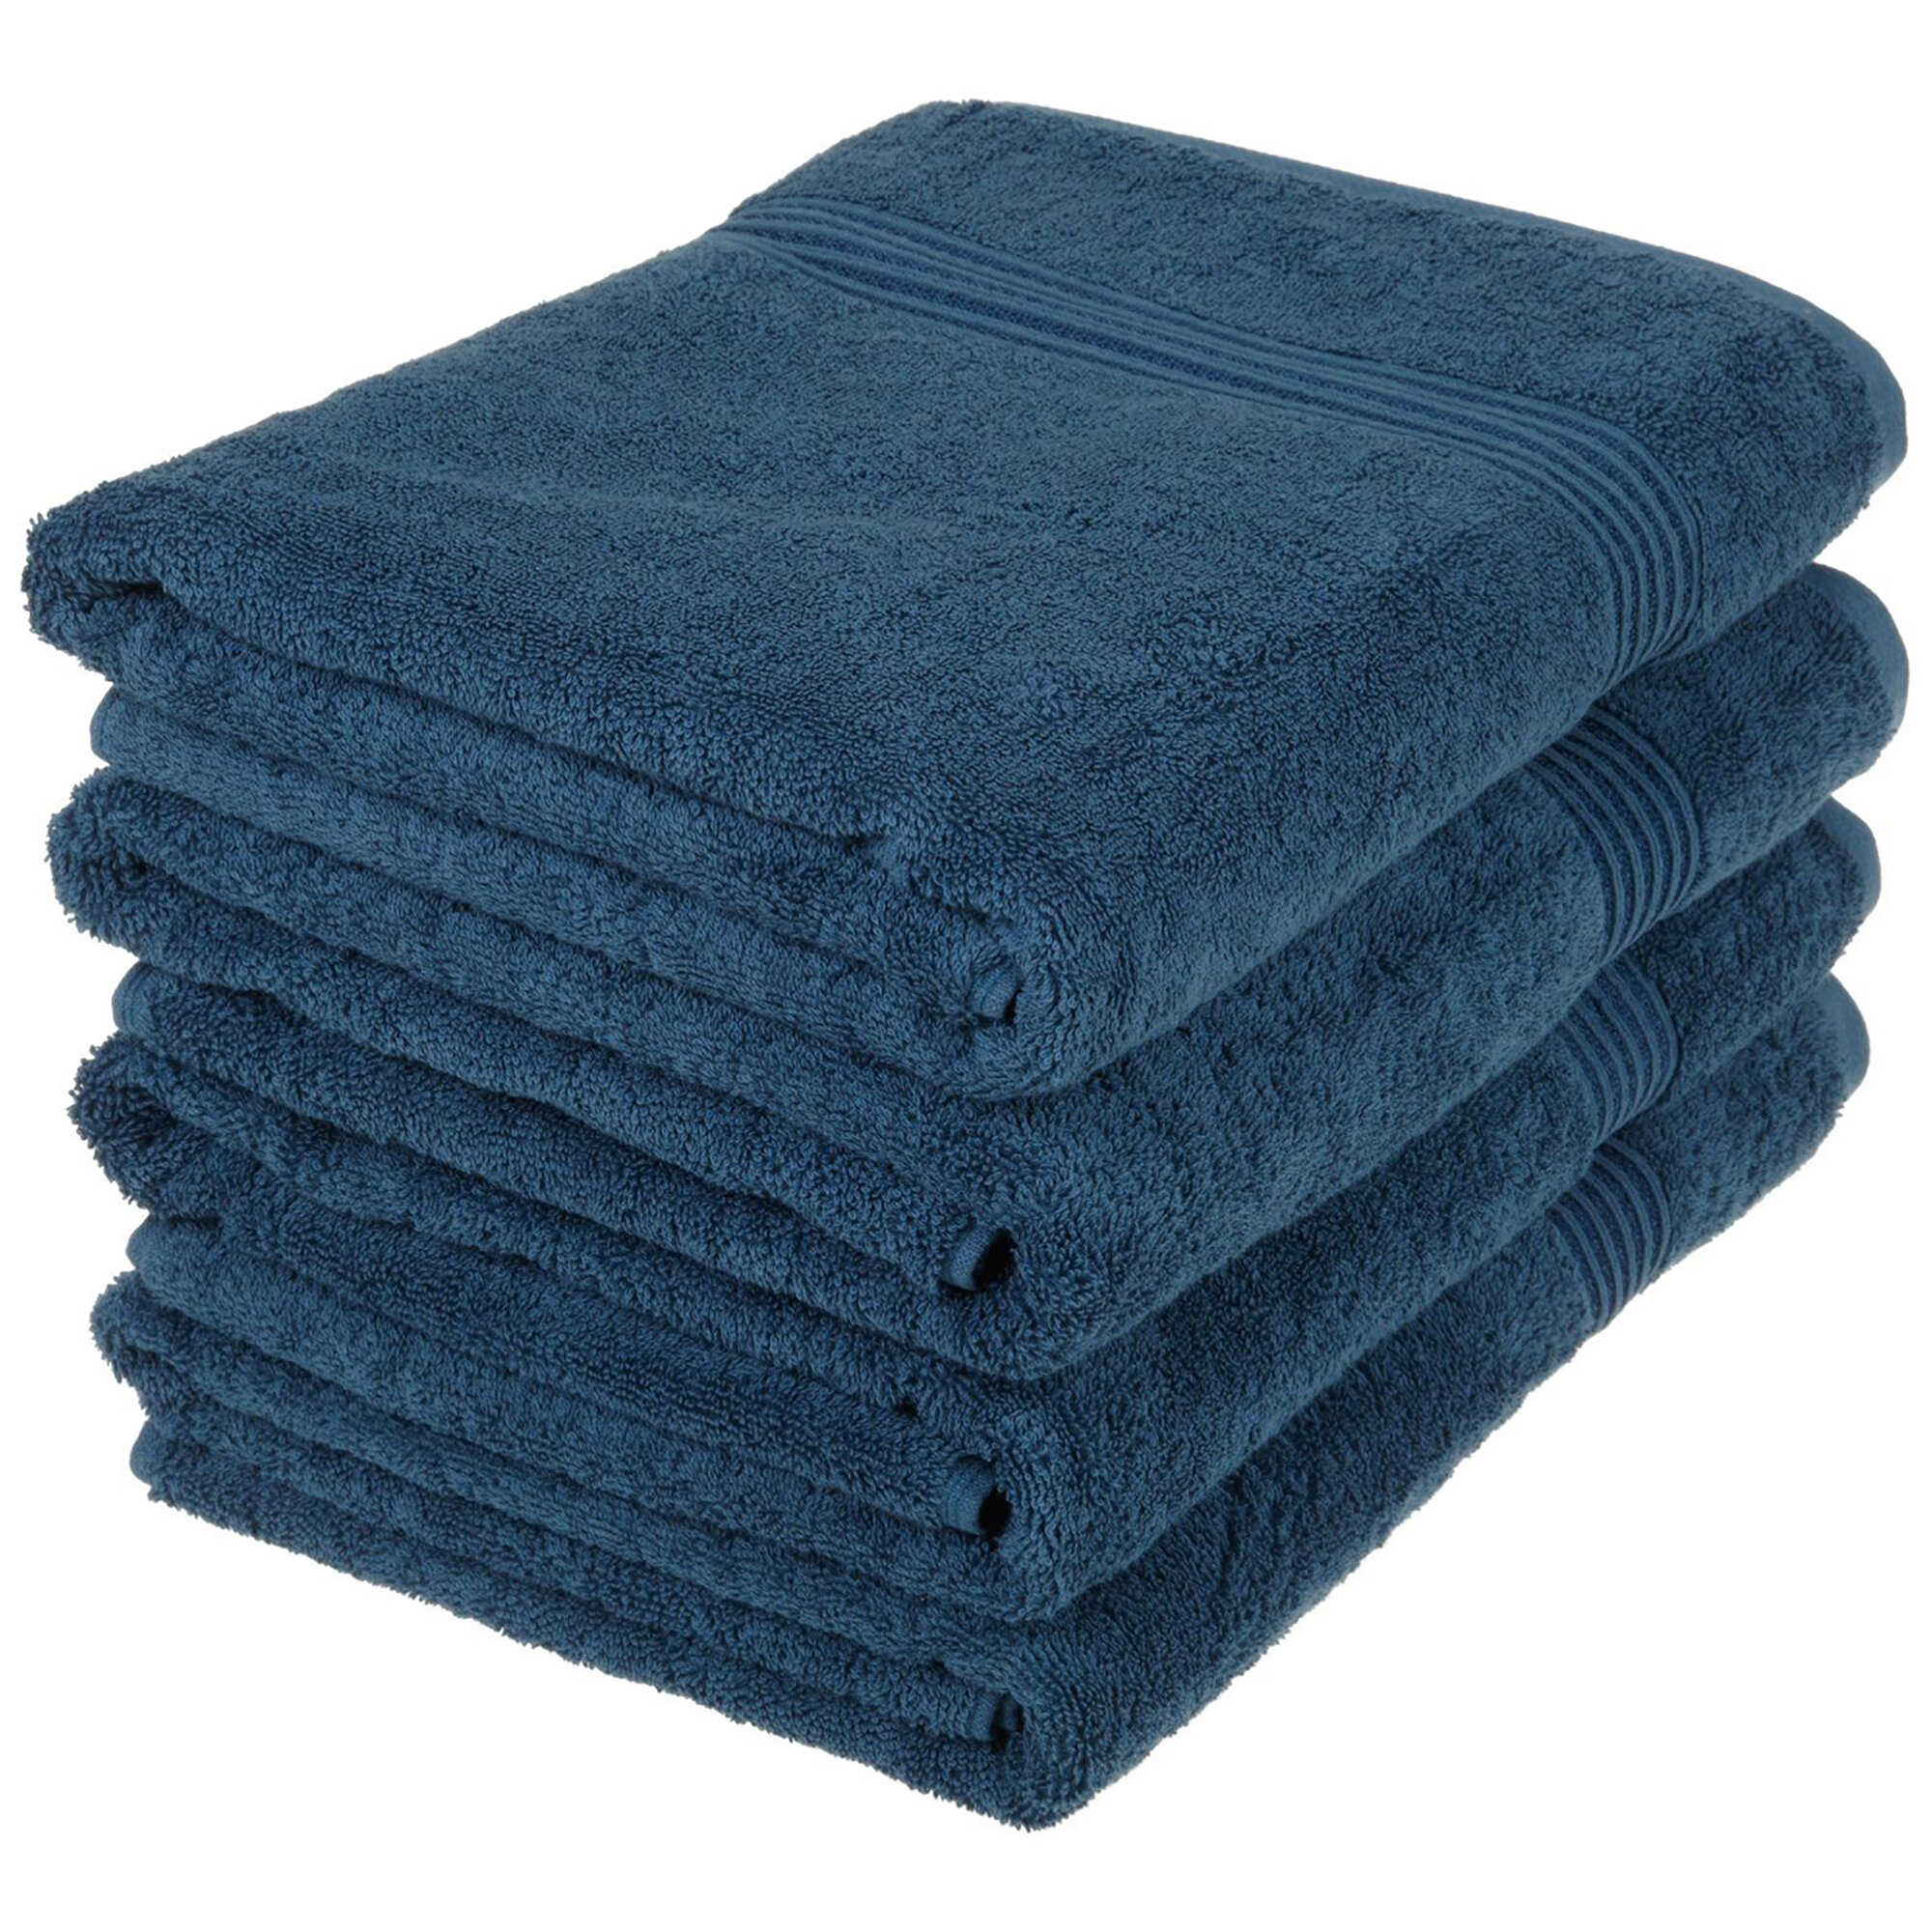 The Twillery Co Patric 4 Piece Egyptian Quality Cotton Bath Towel Set Reviews Wayfair